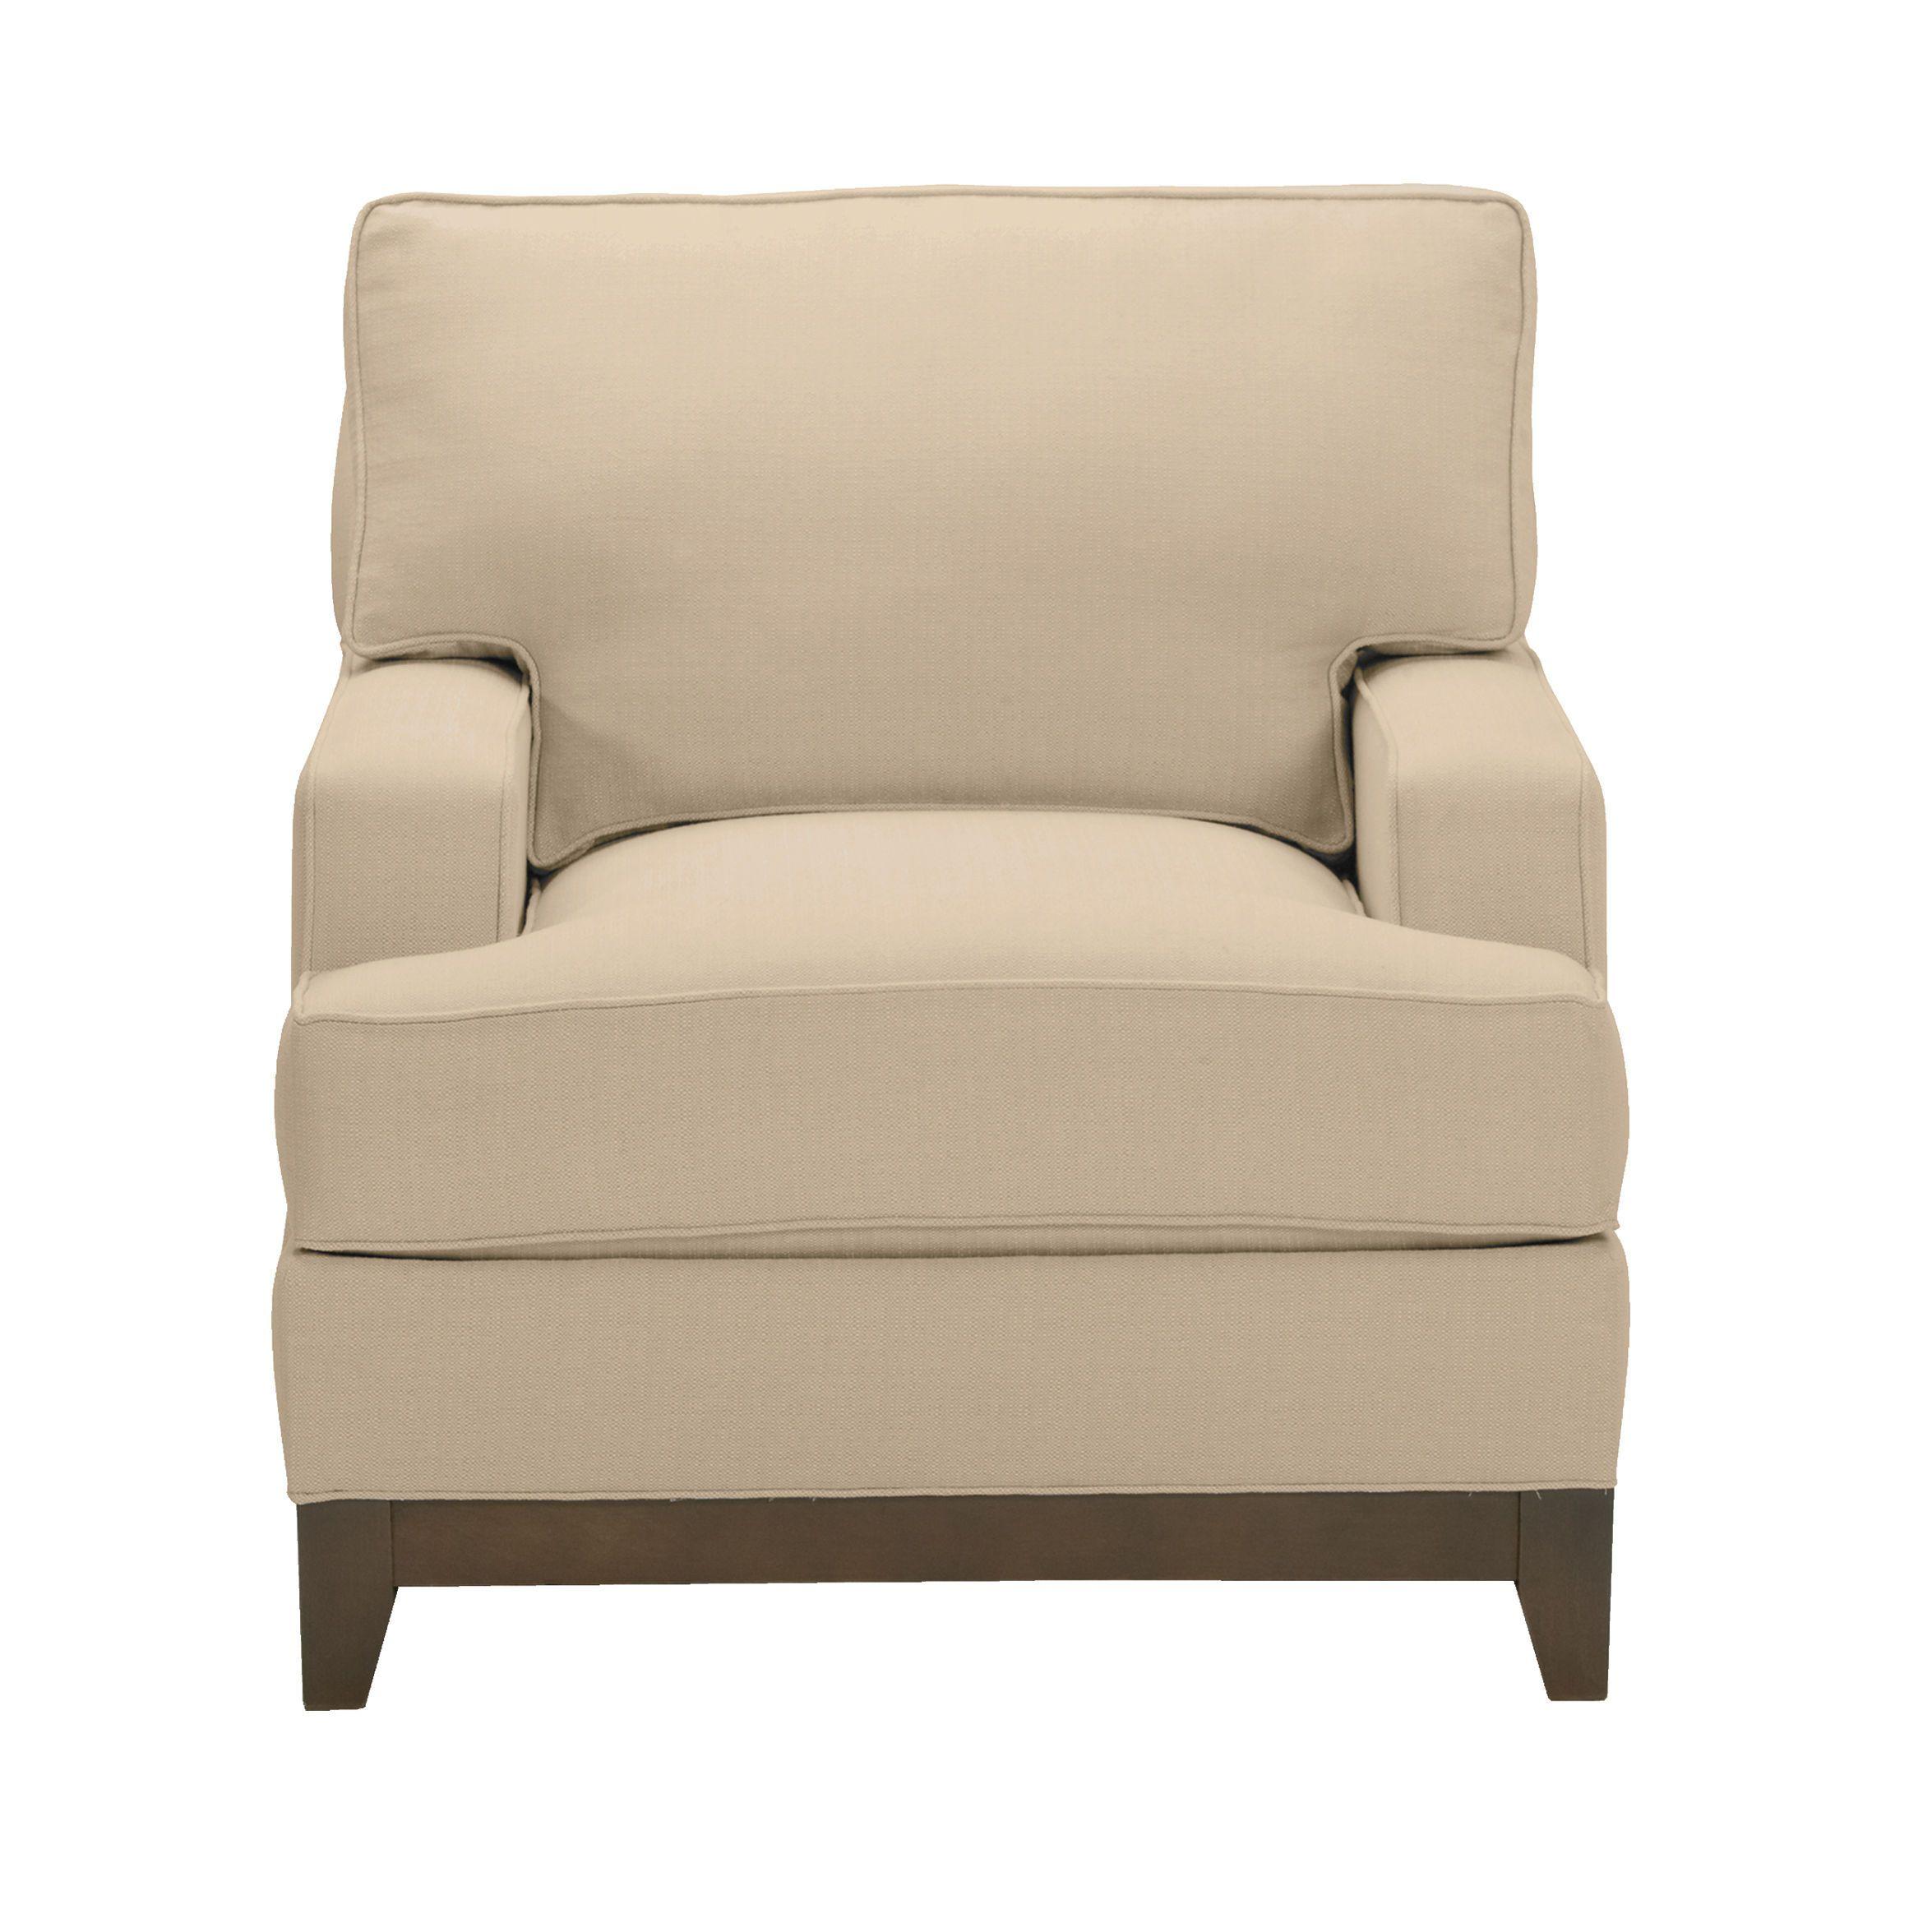 Arcata Chair, Cayman/Bone - Ethan Allen US   Original Living Room ...